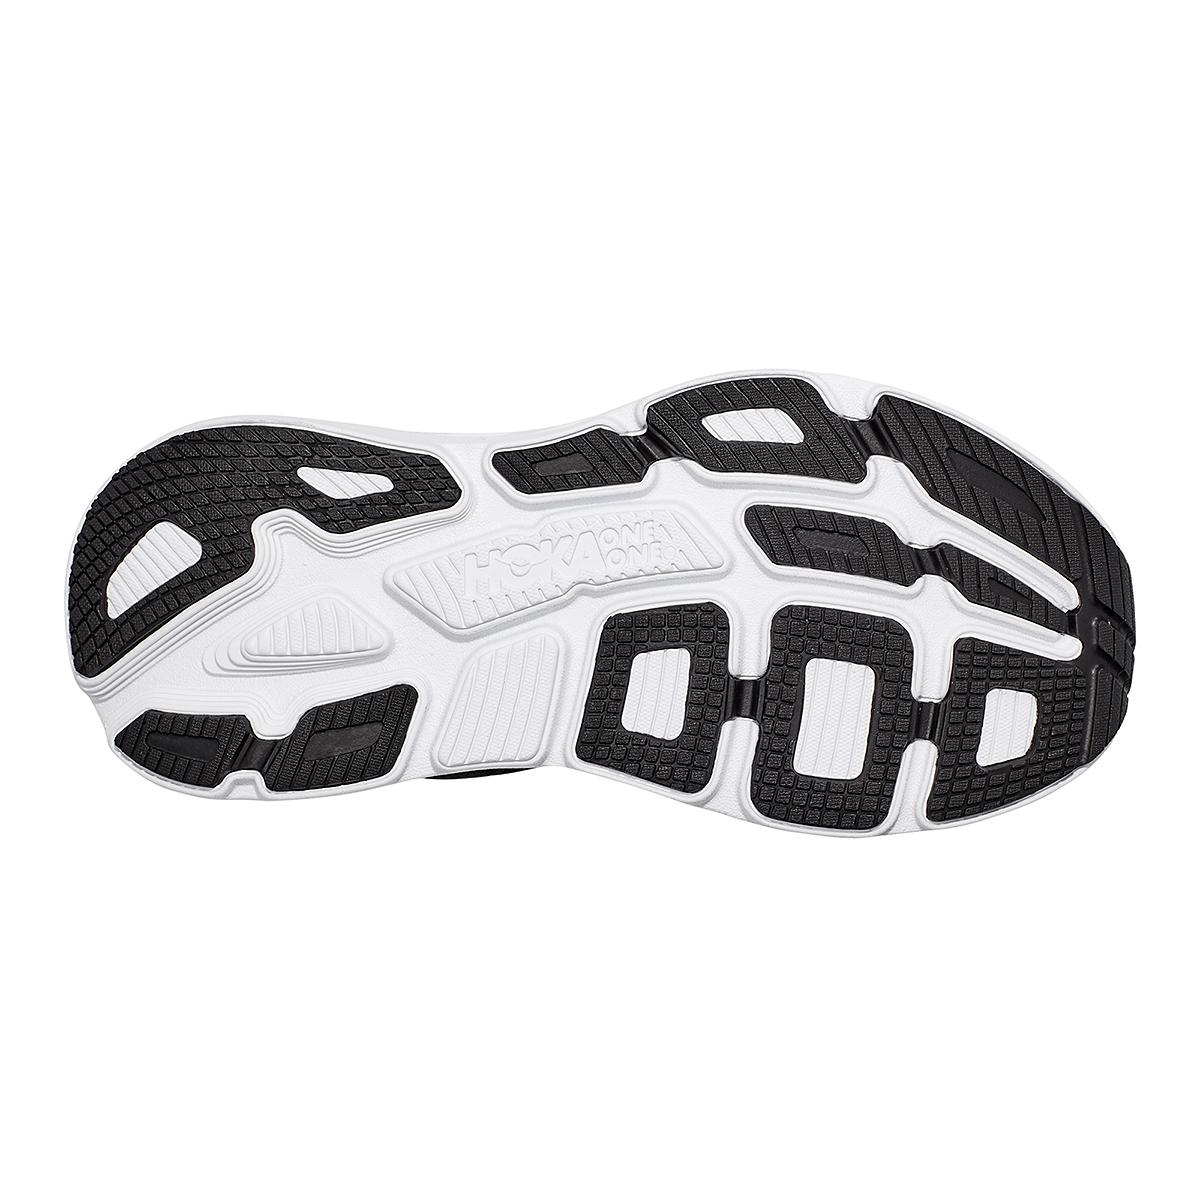 Women's Hoka One One Bondi 7 Running Shoe - Color: Black/White - Size: 5 - Width: Regular, Black/White, large, image 6